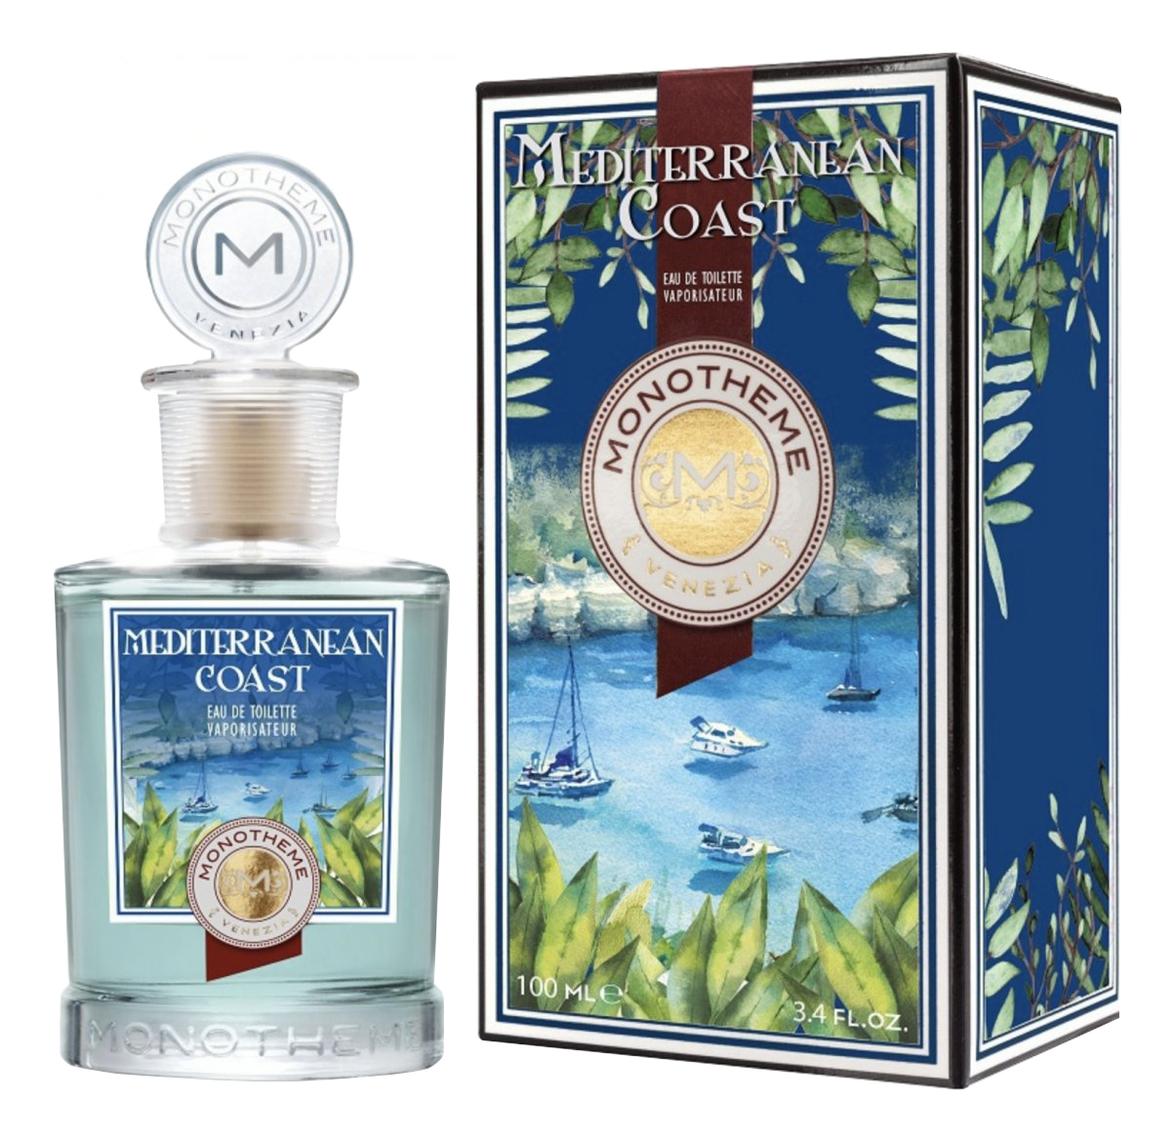 Купить Mediterranean Coast: туалетная вода 100мл, Monotheme Fine Fragrances Venezia